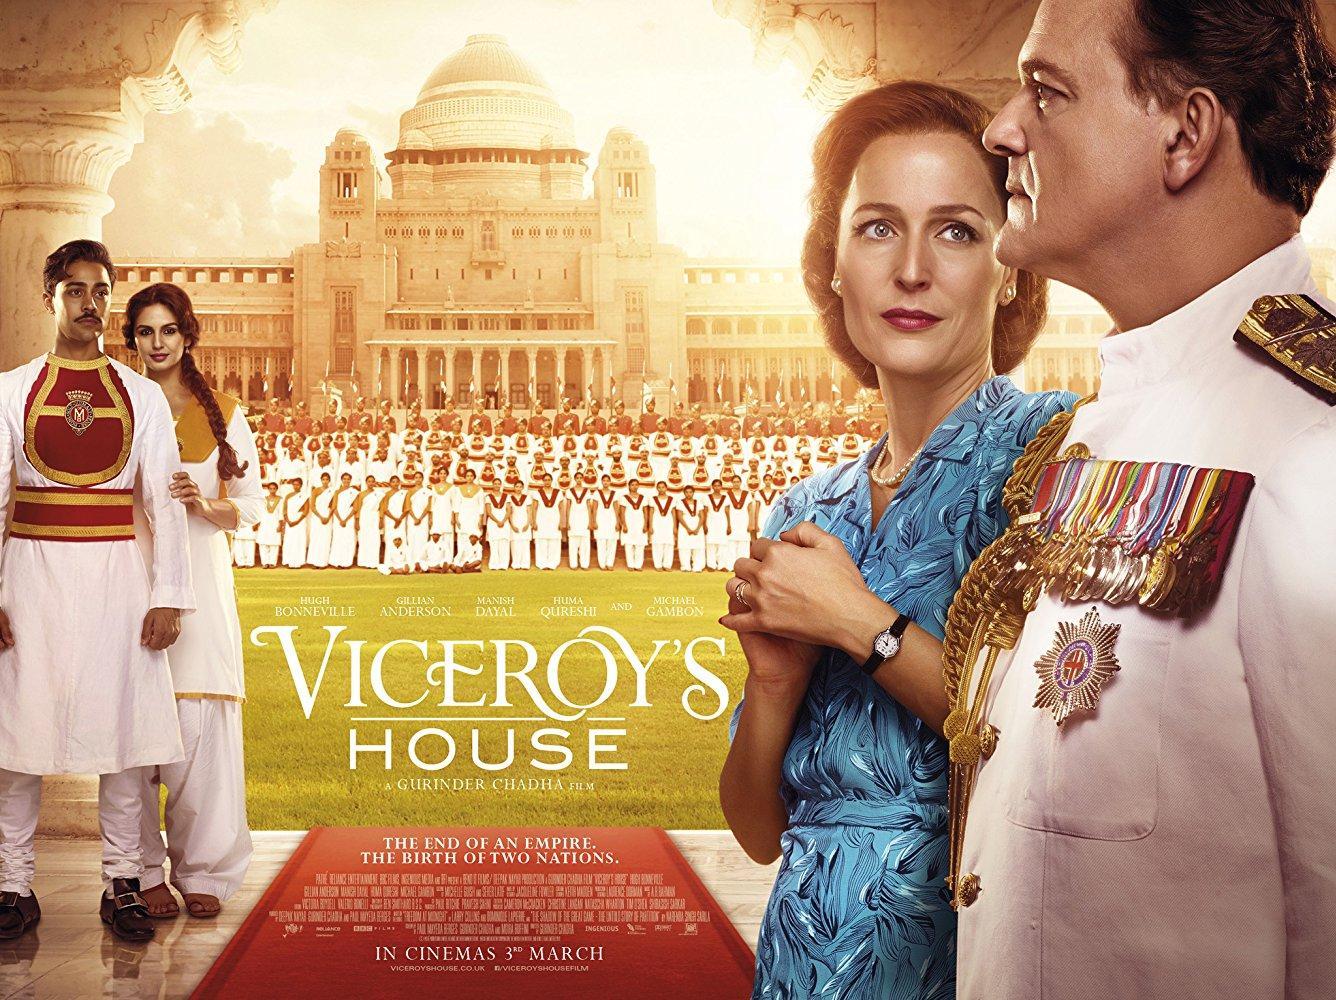 مشاهدة فيلم Viceroy's House 2017 HD مترجم كامل اون لاين